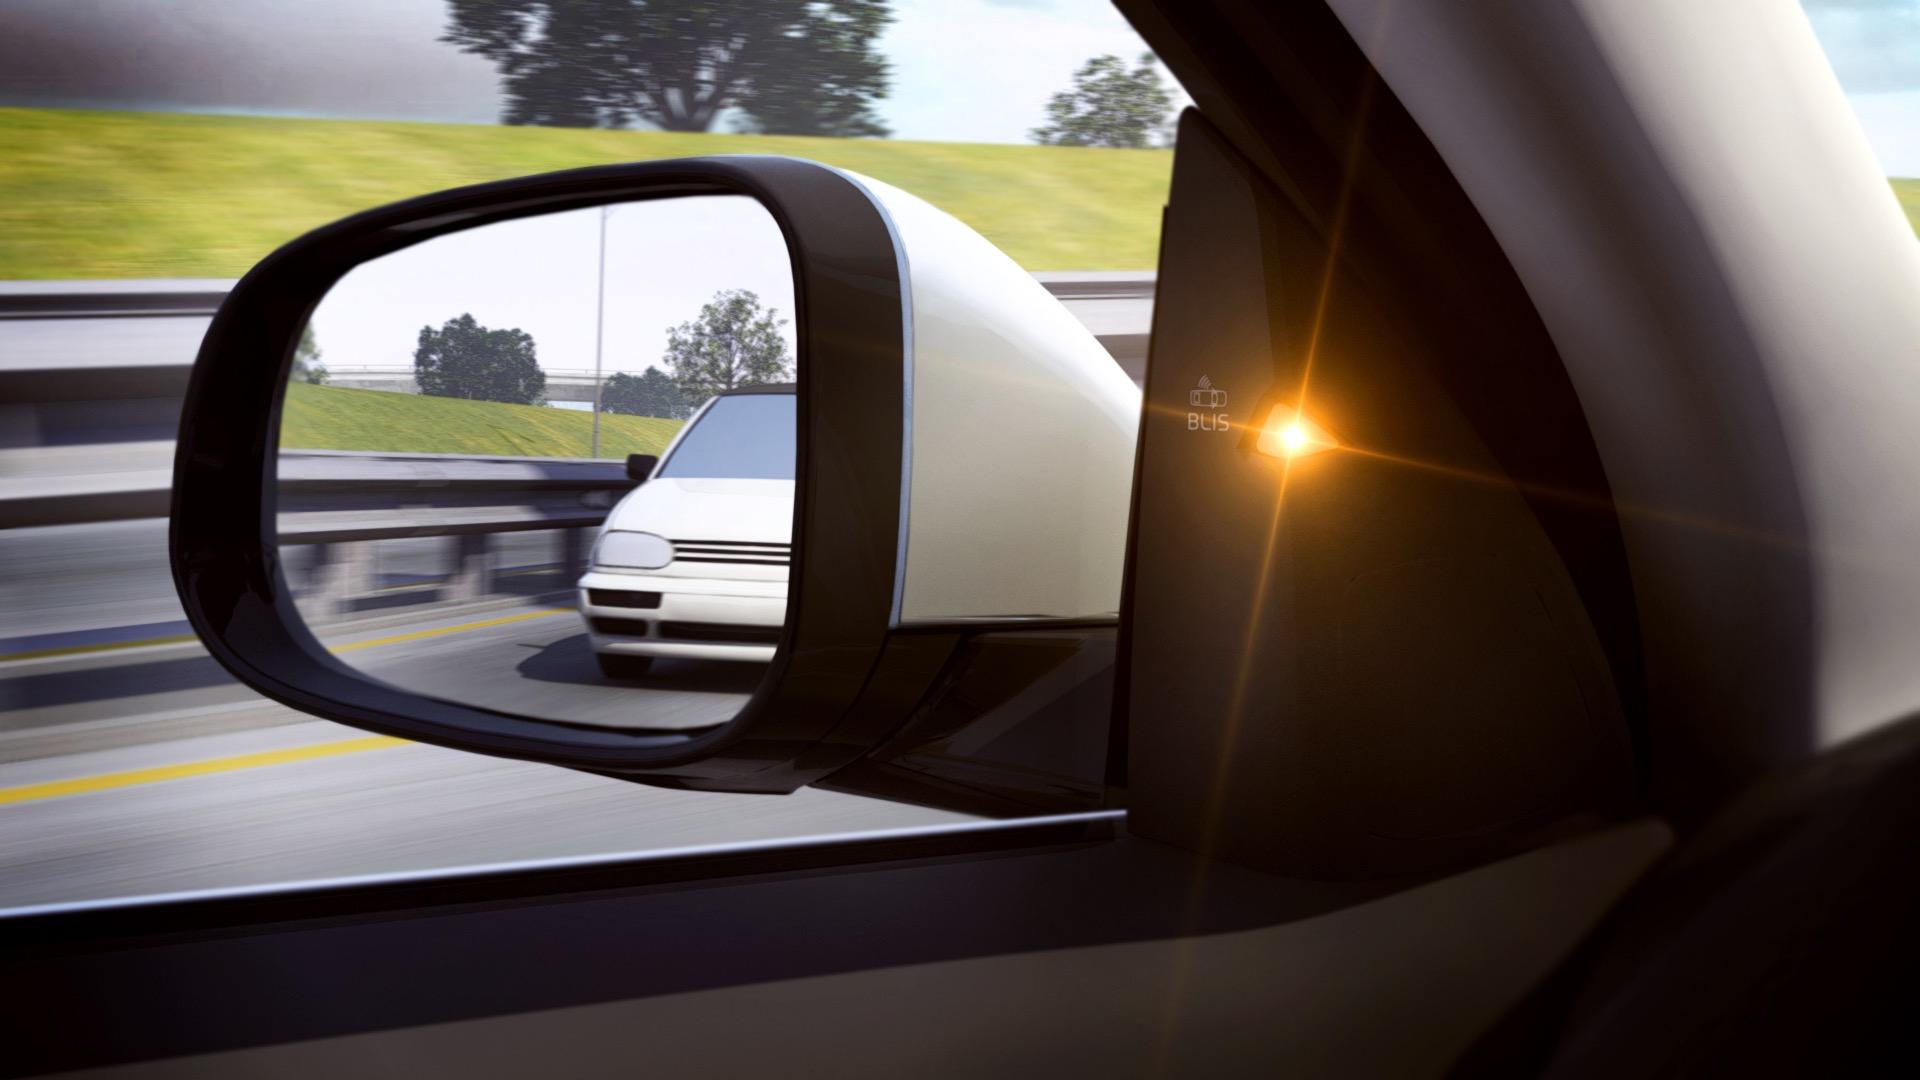 Blind Spot Information System (blis) -  2013, 2014, Images, S60, Safety, Technology, V40, V60, Volvo, XC60